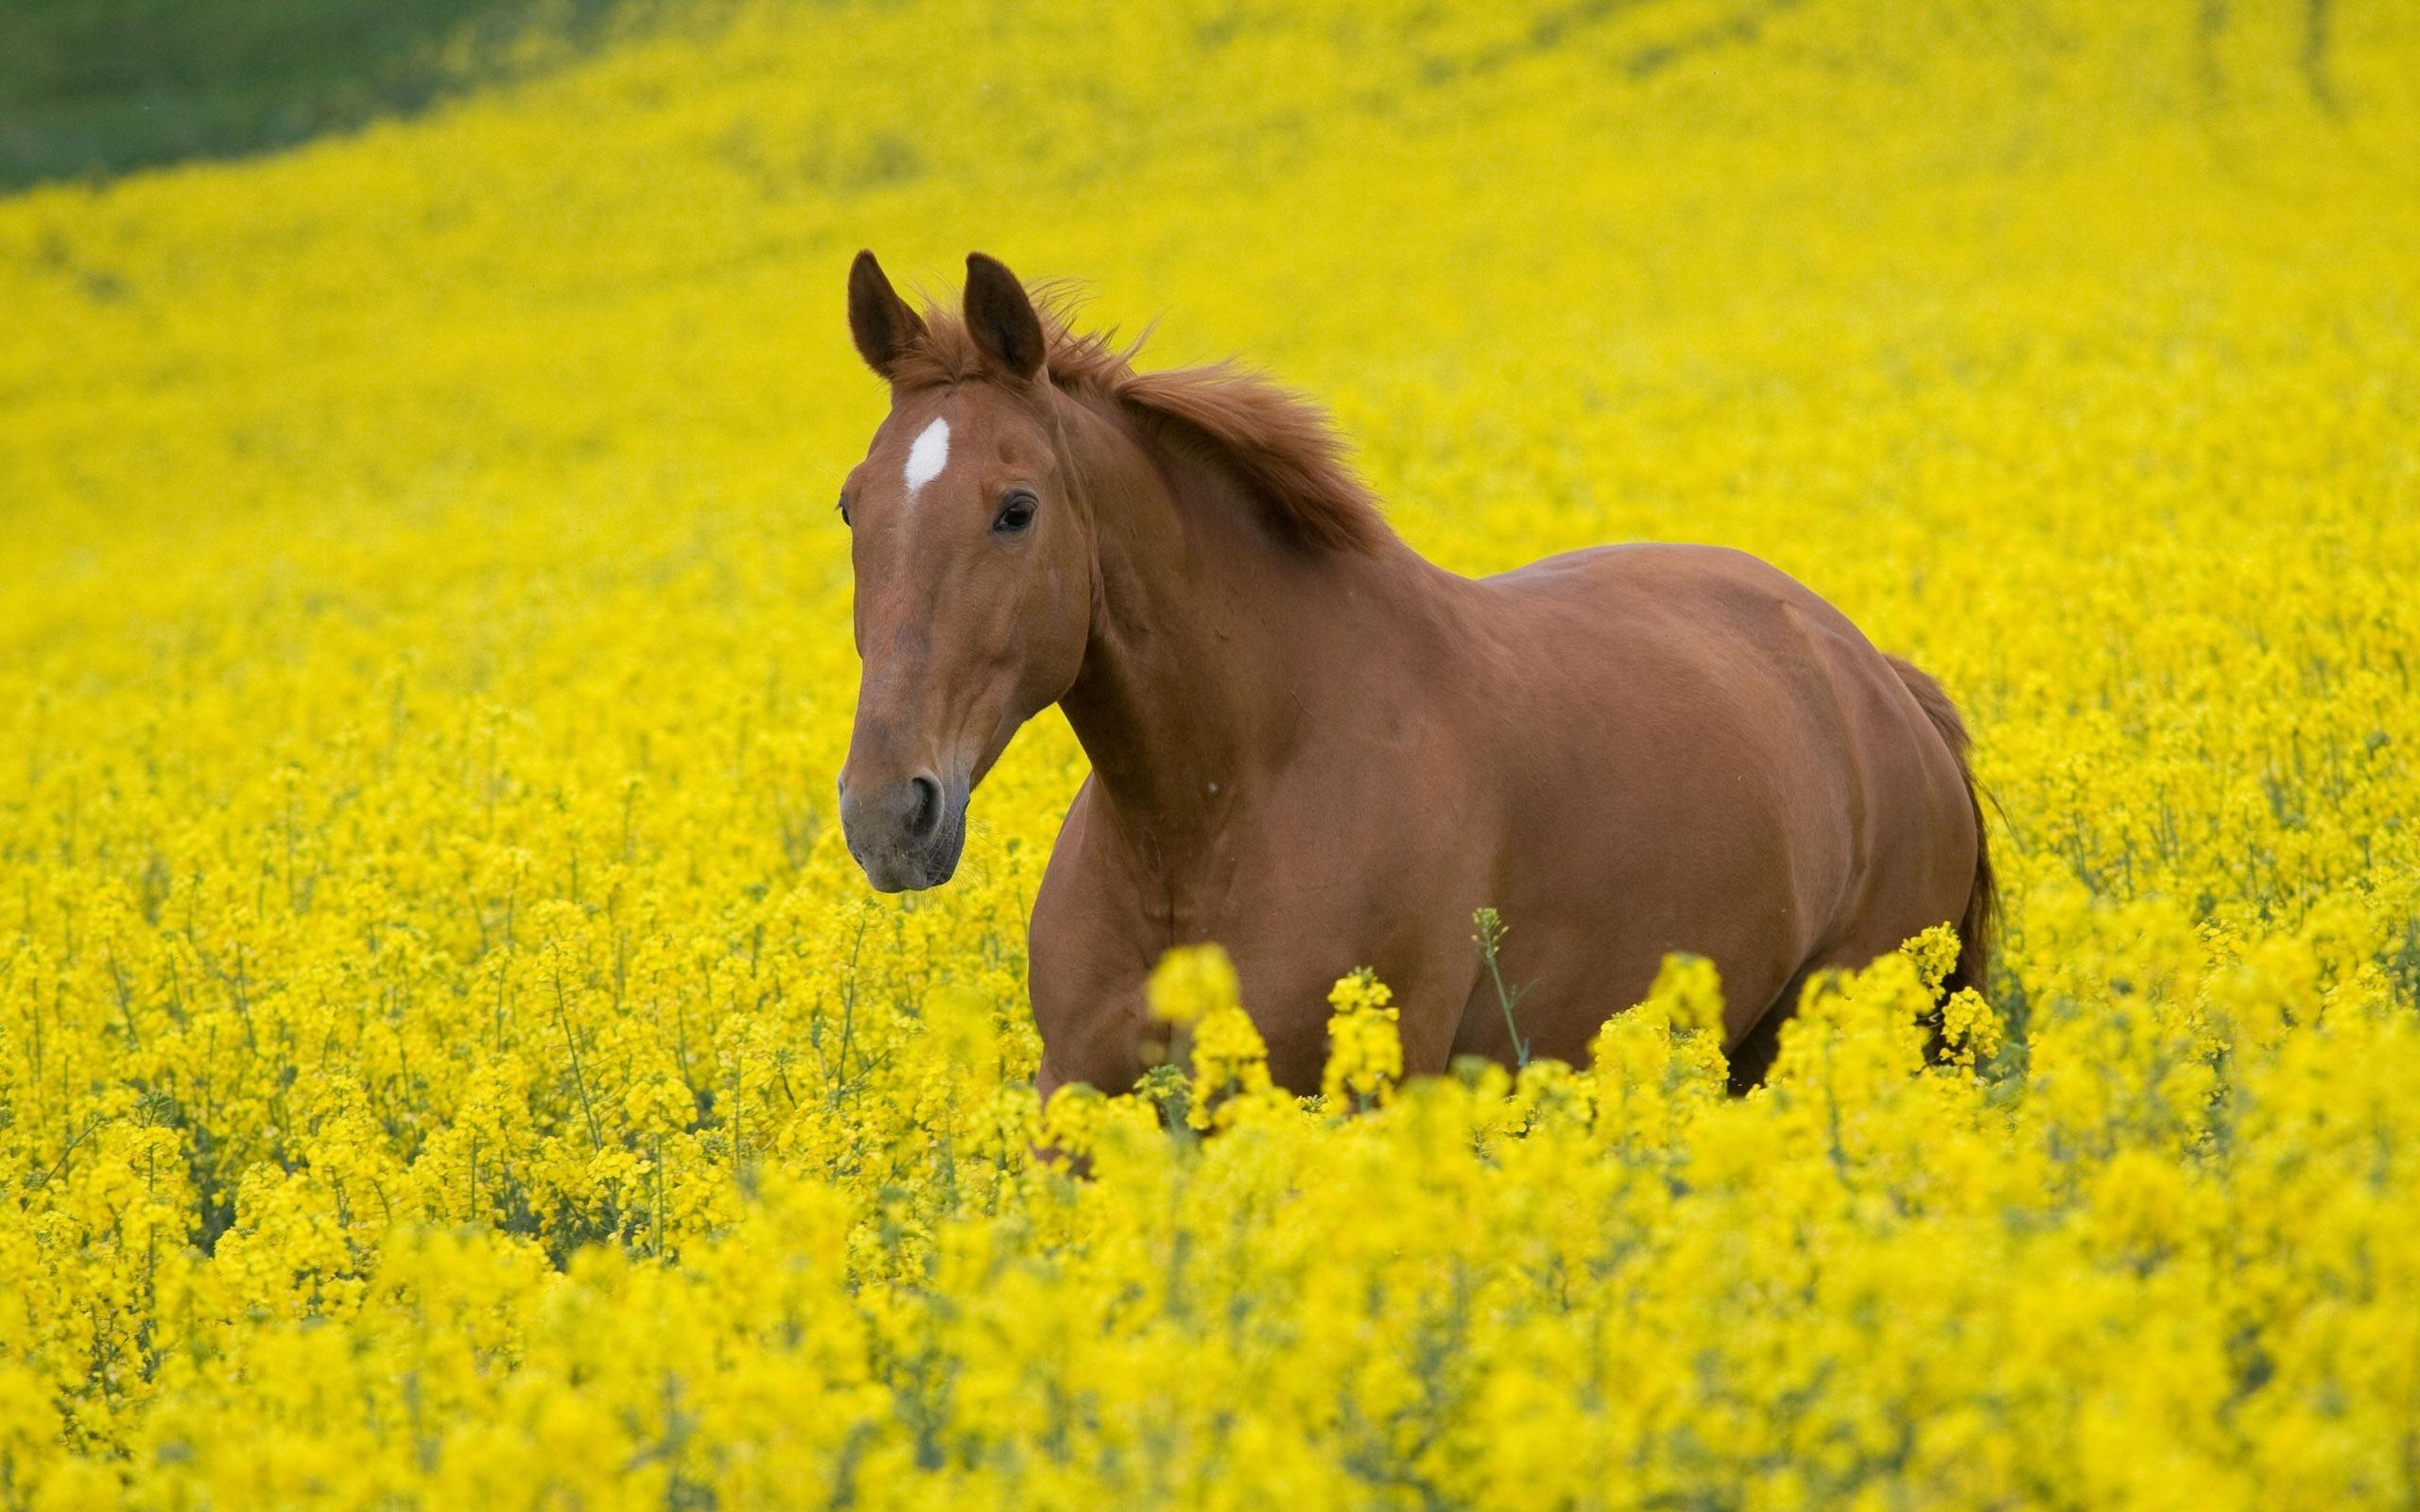 Beautiful Wallpaper Horse Yellow - 91ea4932b55162f6d10f1acfcc9b59a1  Graphic_644964.jpg